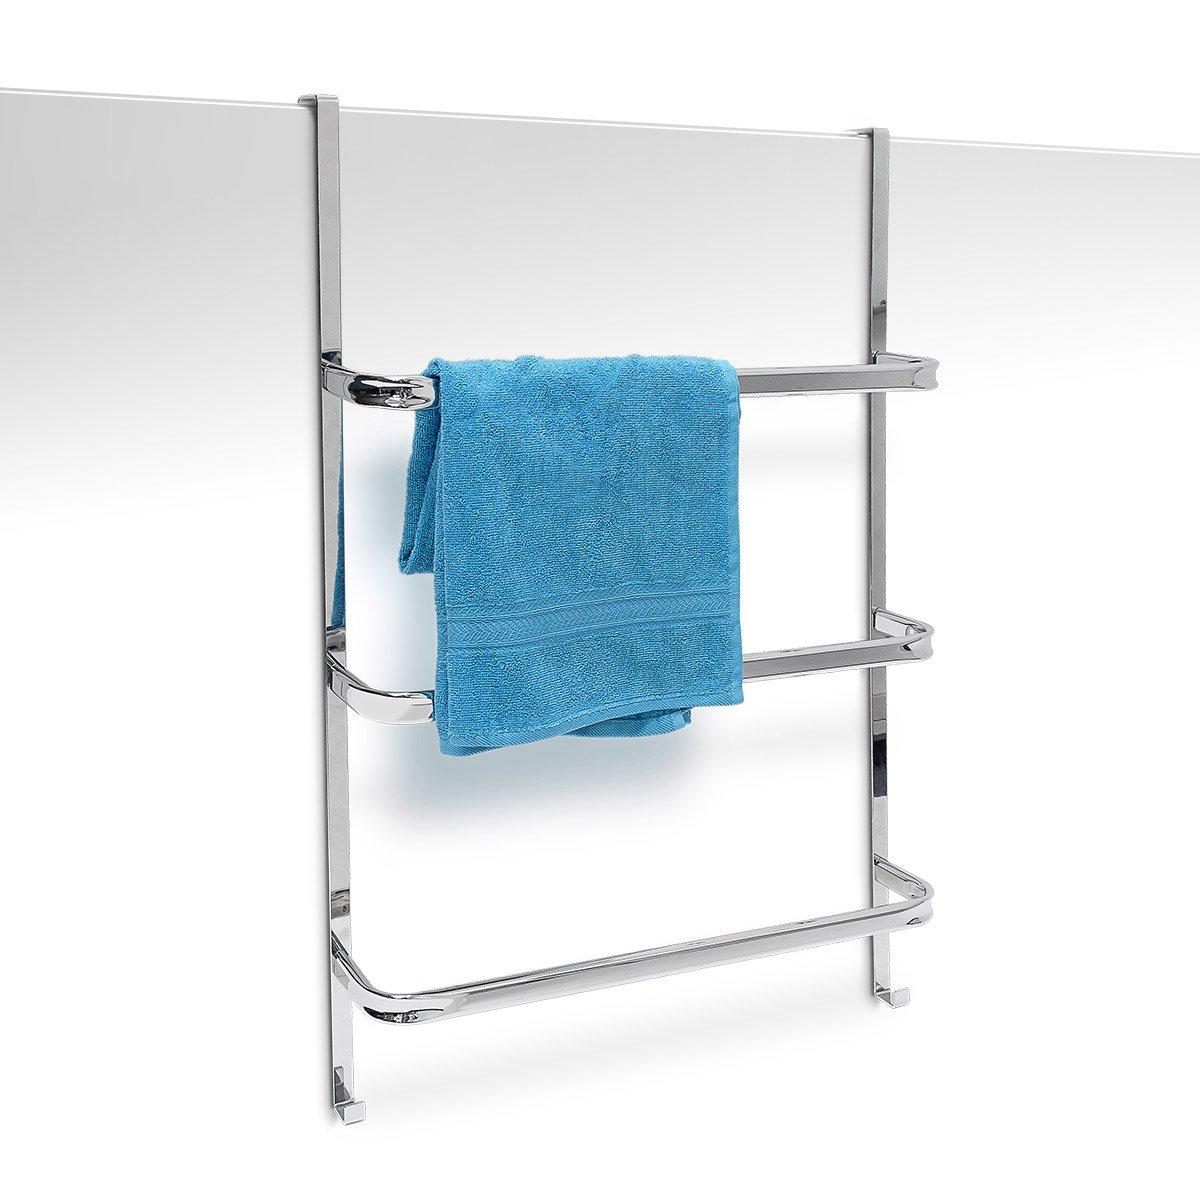 Amazon.de: Handtuchhalter & -stangen: Baumarkt